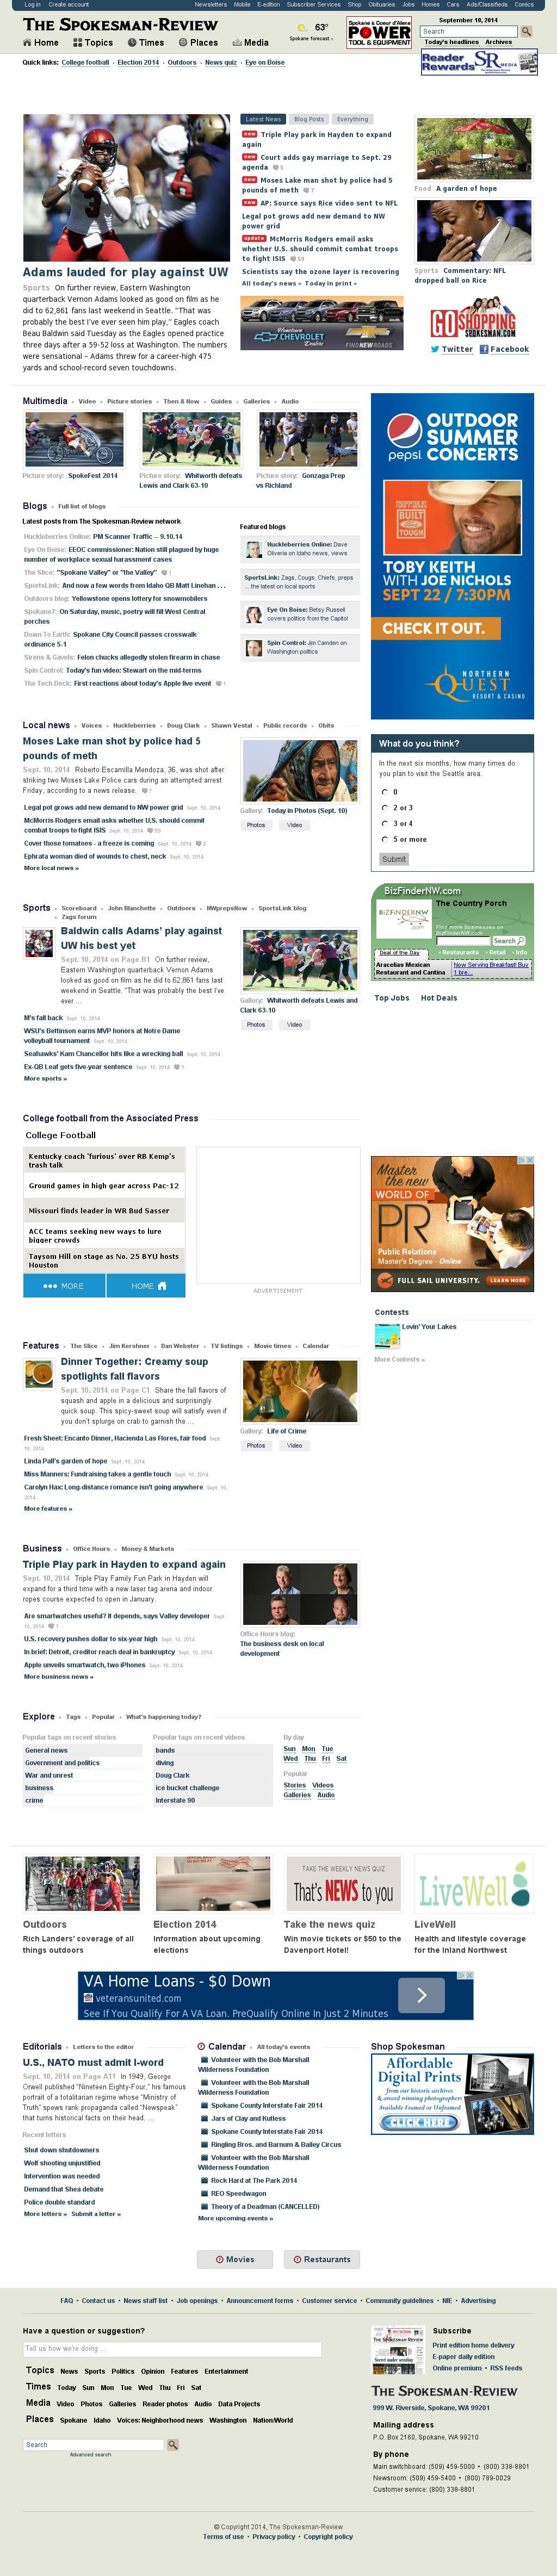 The (Spokane) Spokesman-Review at Wednesday Sept. 10, 2014, 11:26 p.m. UTC